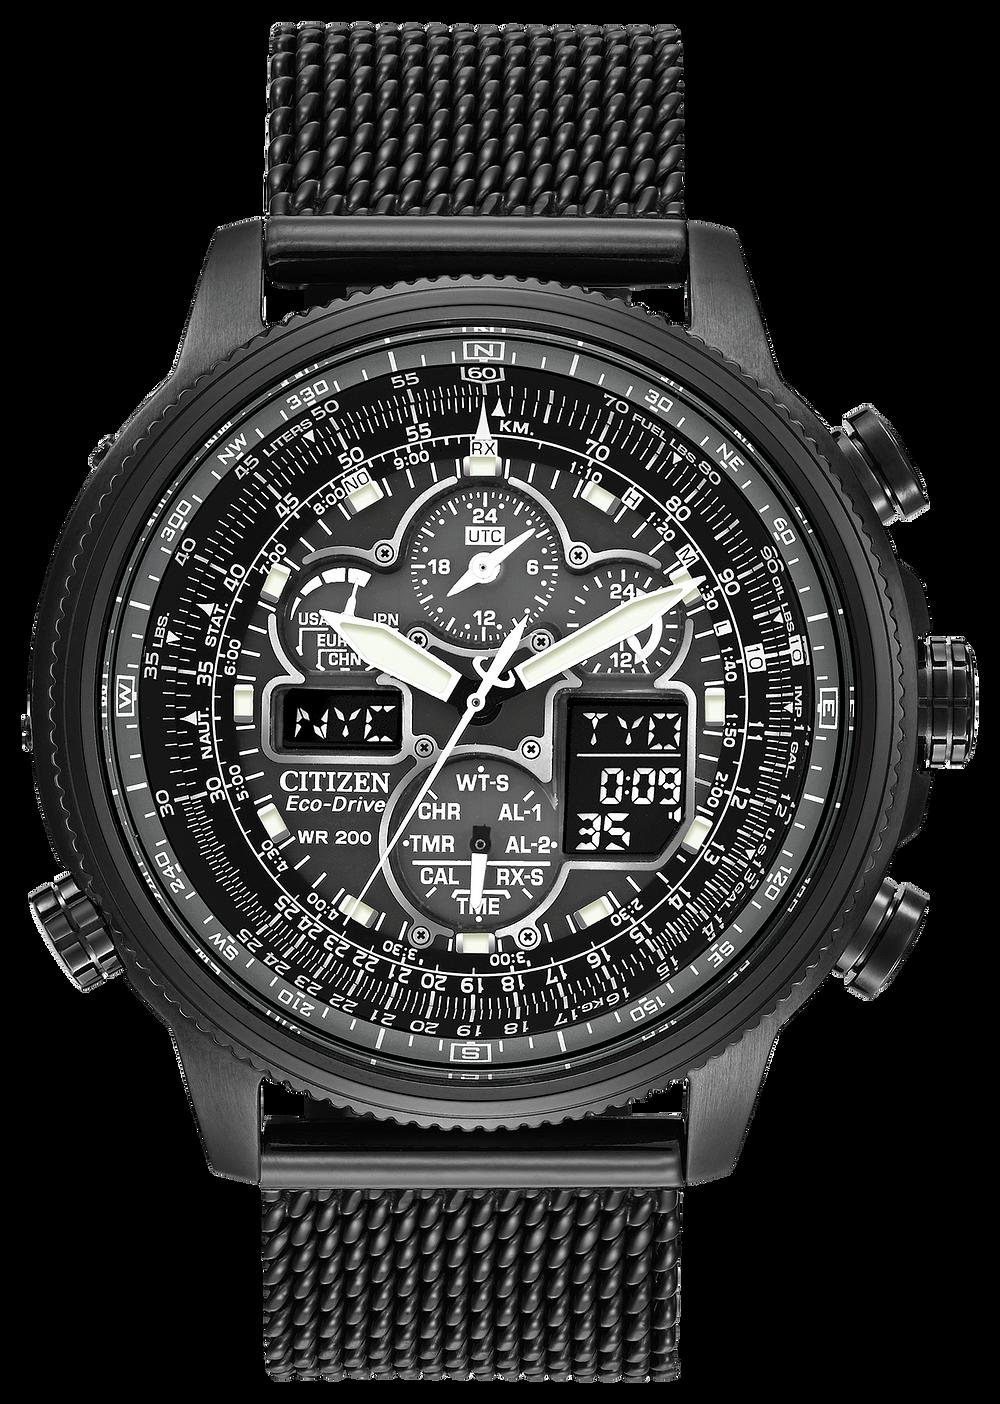 3ef609bb9 Promaster Navihawk A-T - Men's Chronograph JY8037-50E Watch | Citizen